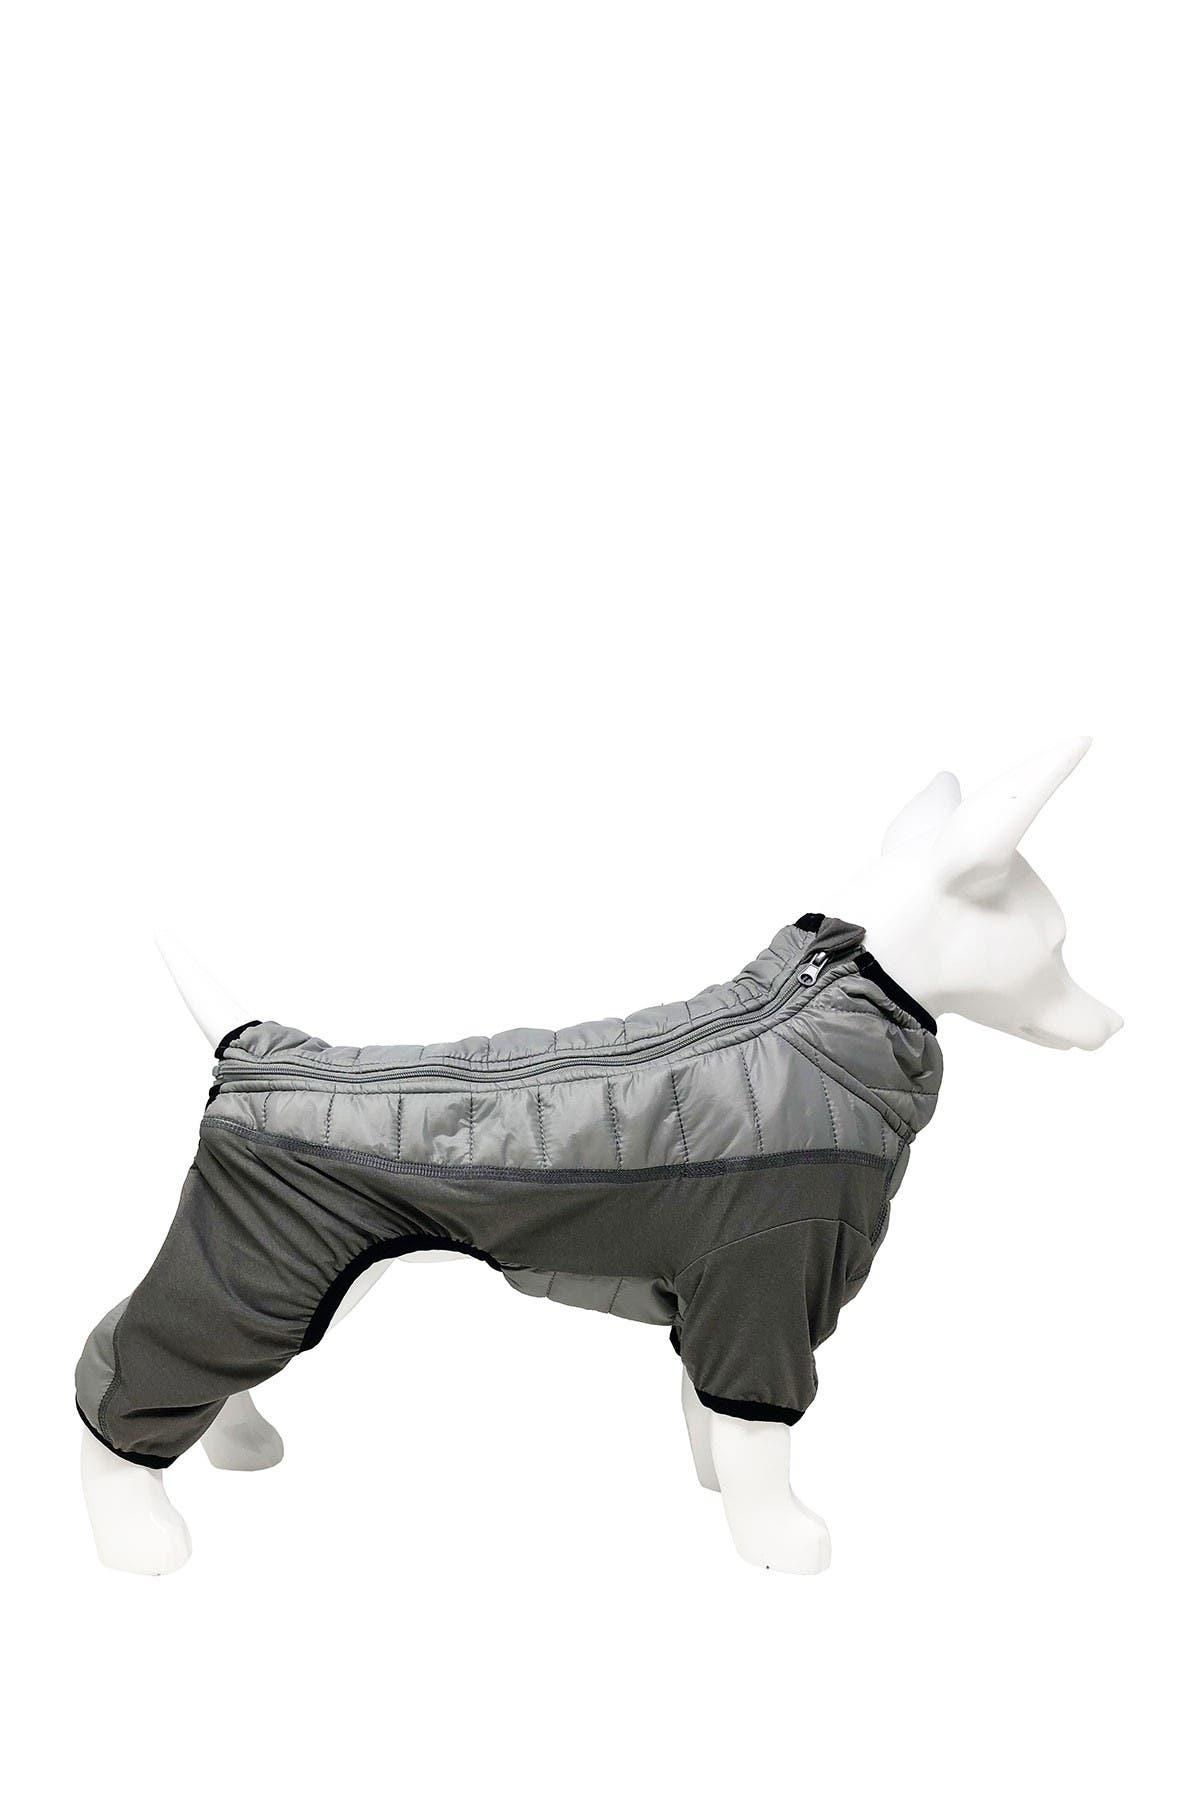 Image of Pet Life 'Aura-Vent' Lightweight 4-Season Stretch & Quick-Dry Full Body Dog Jacket - XL